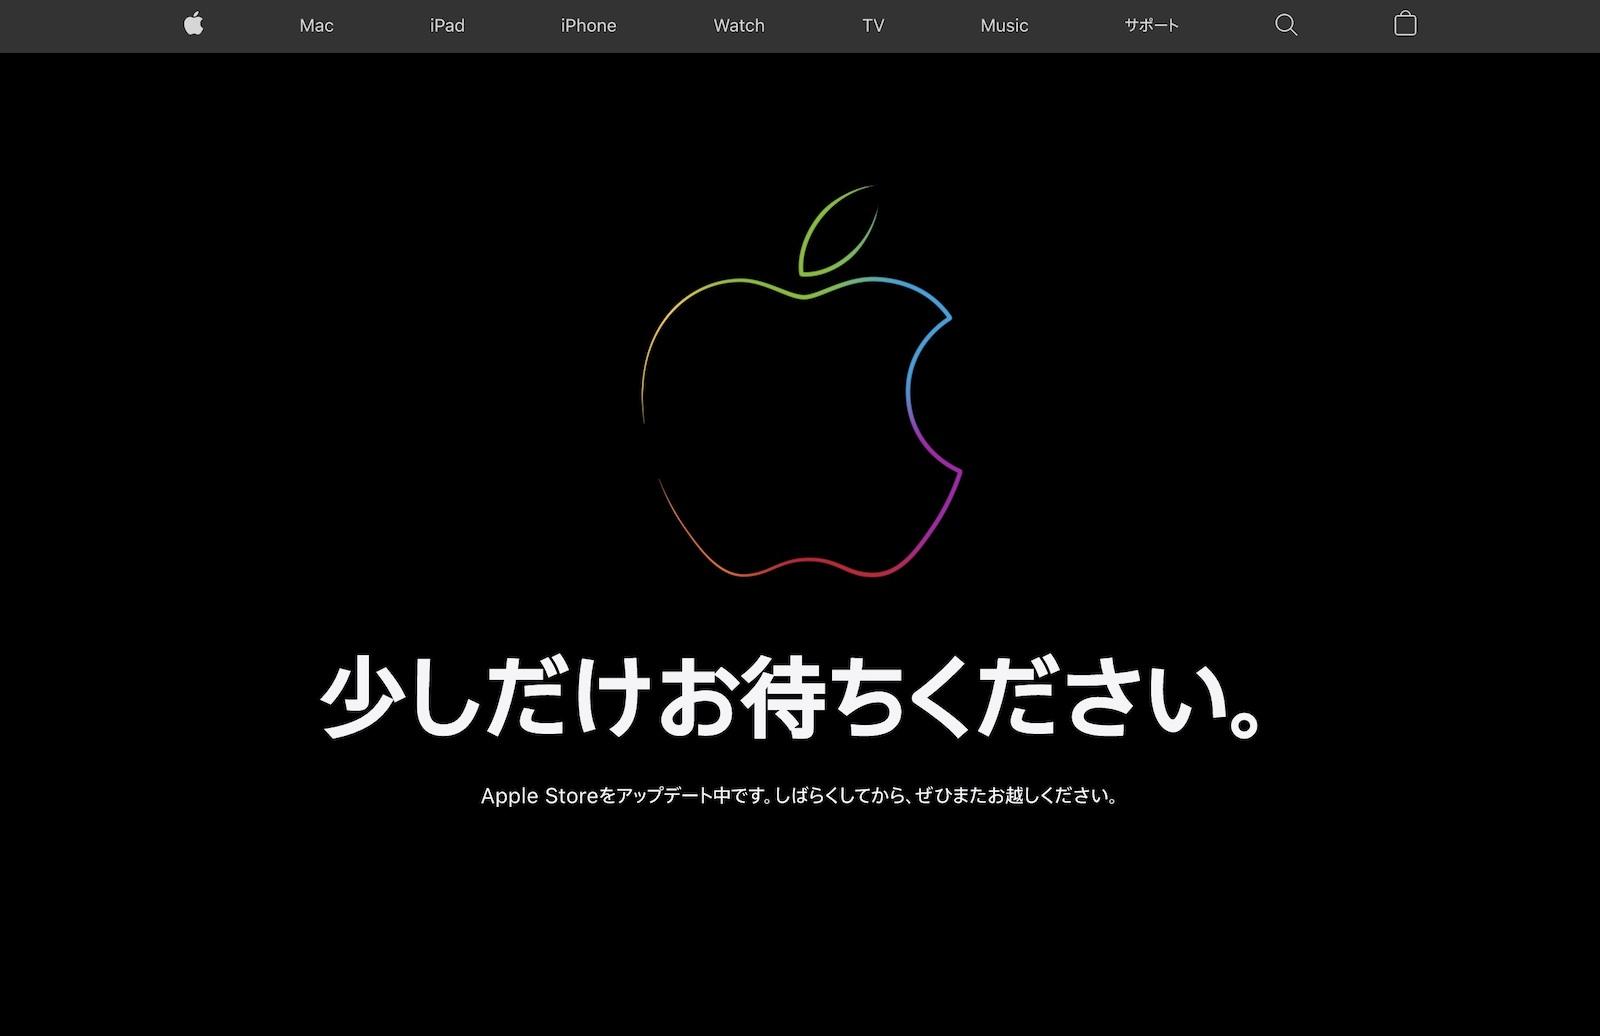 Apple Store Update